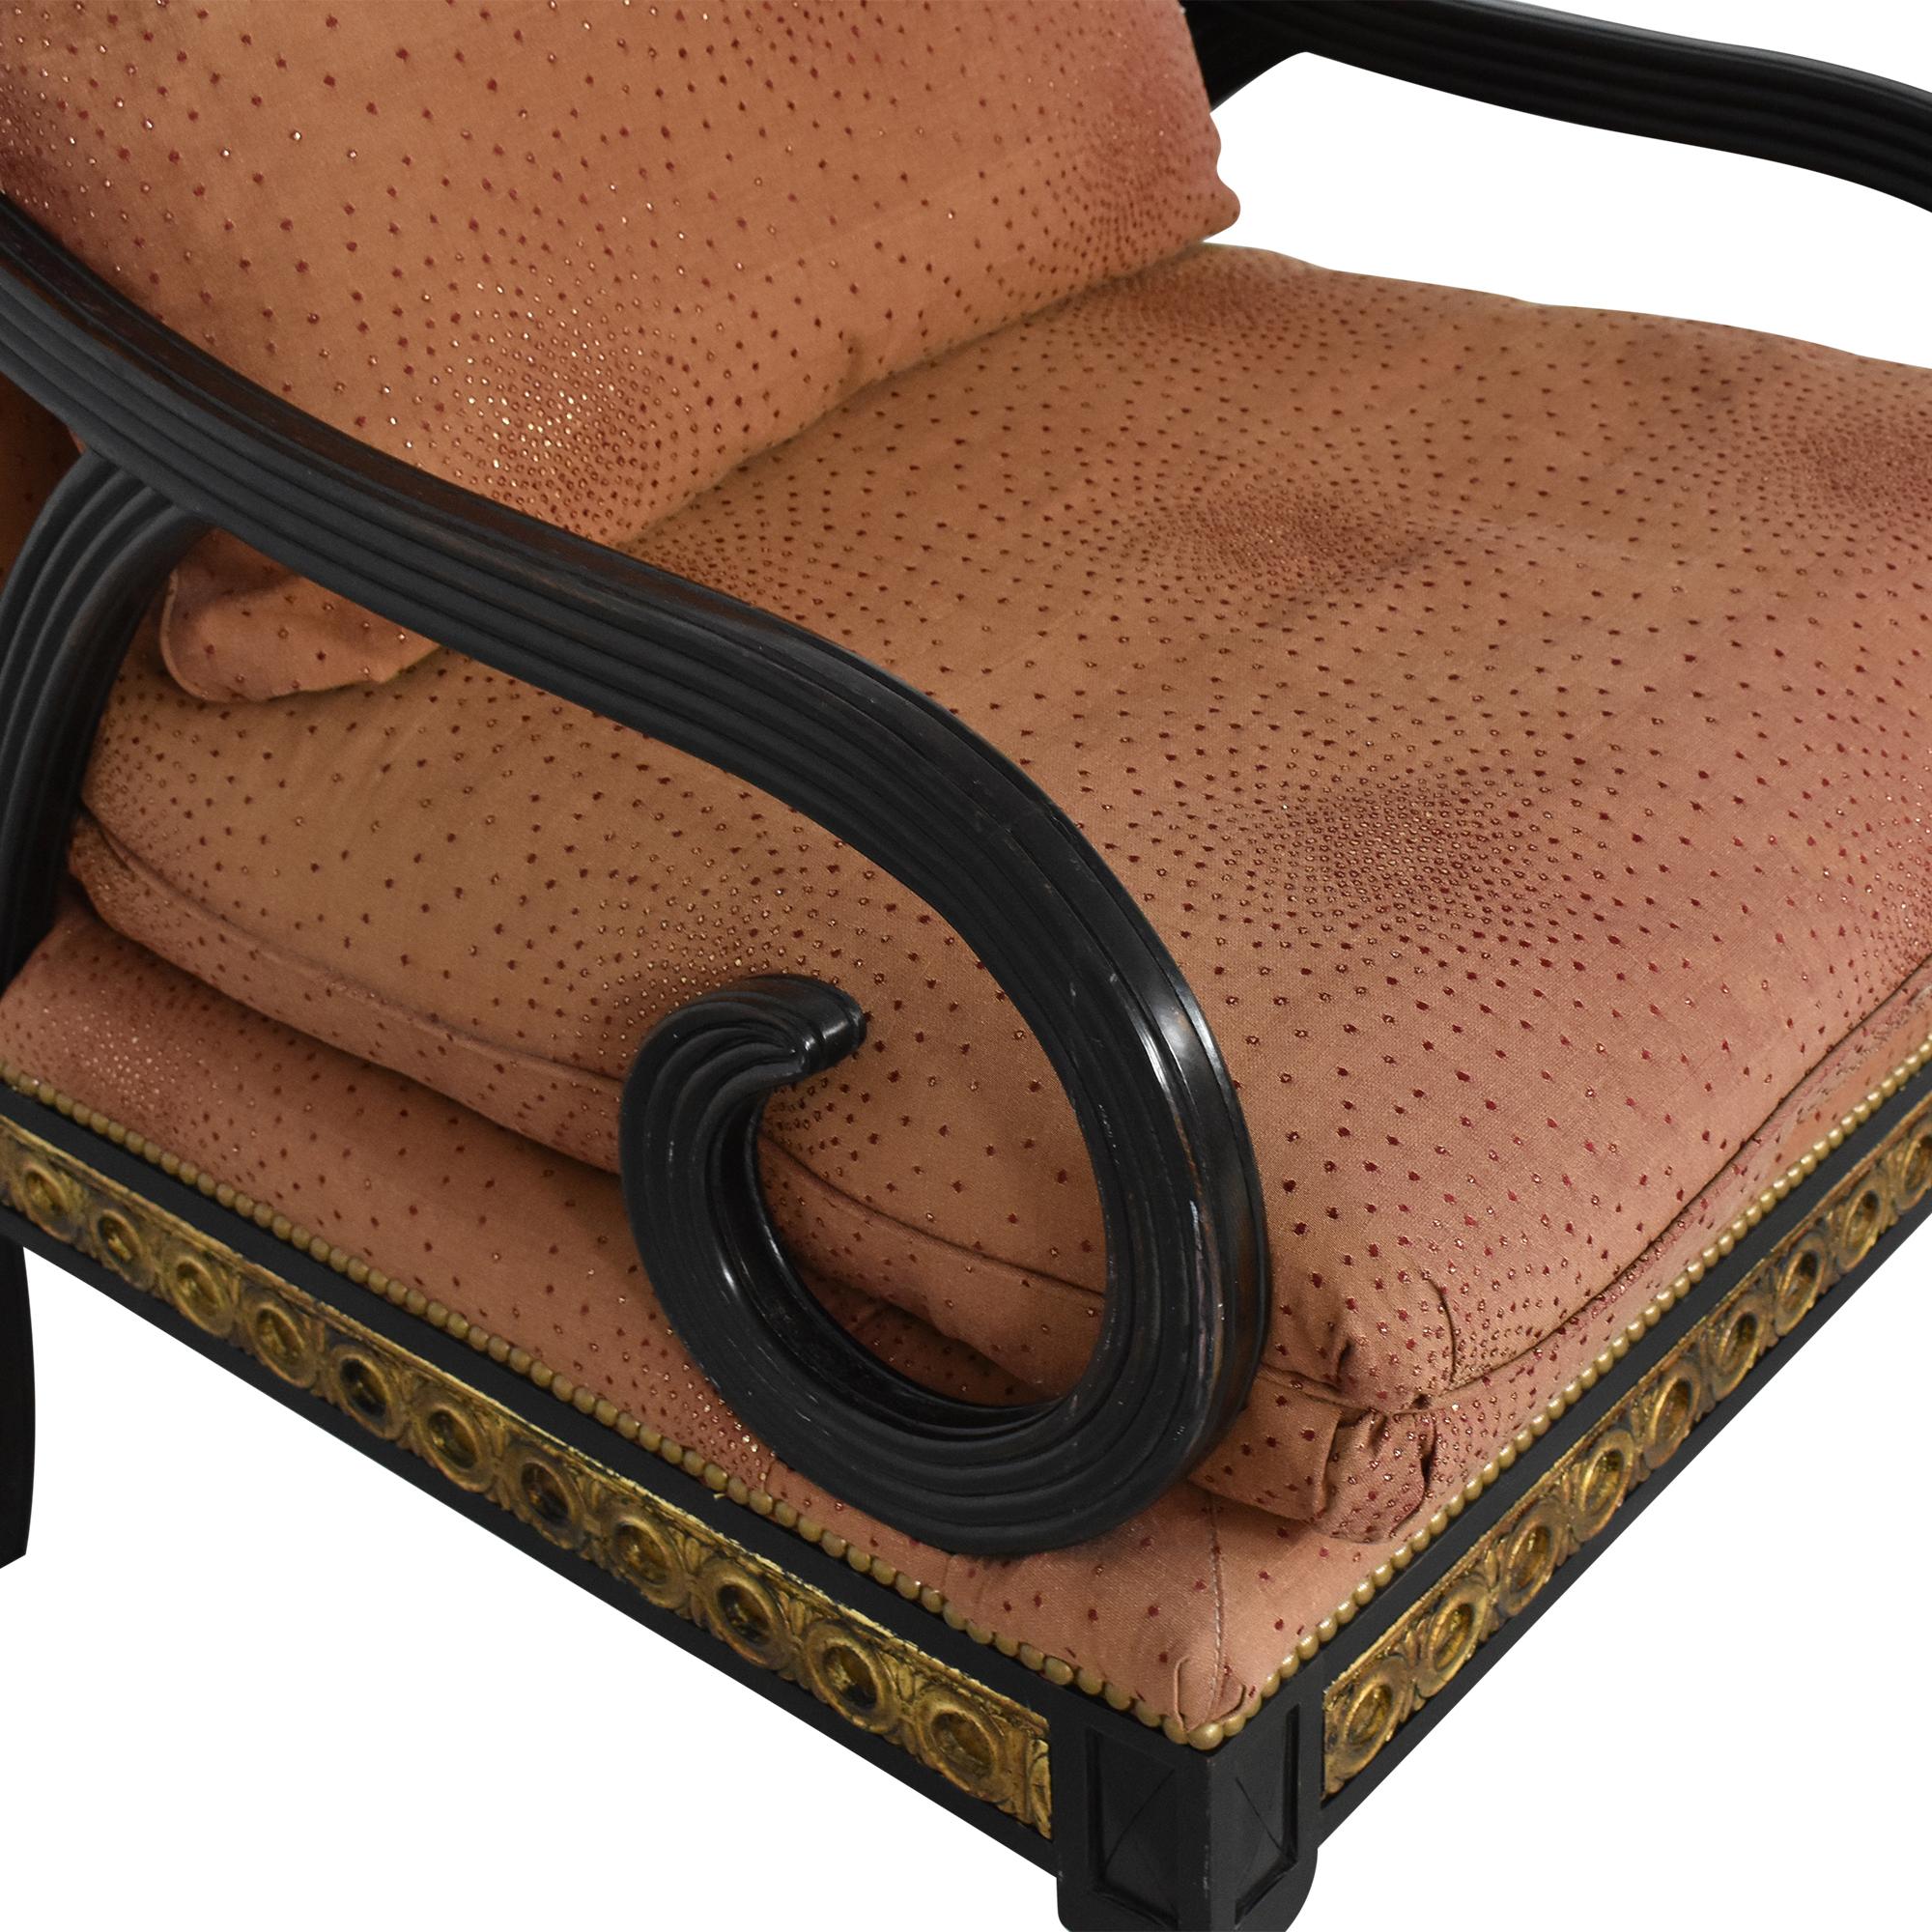 IMI Furniture Scroll Arm Accent Chair IMI Furniture